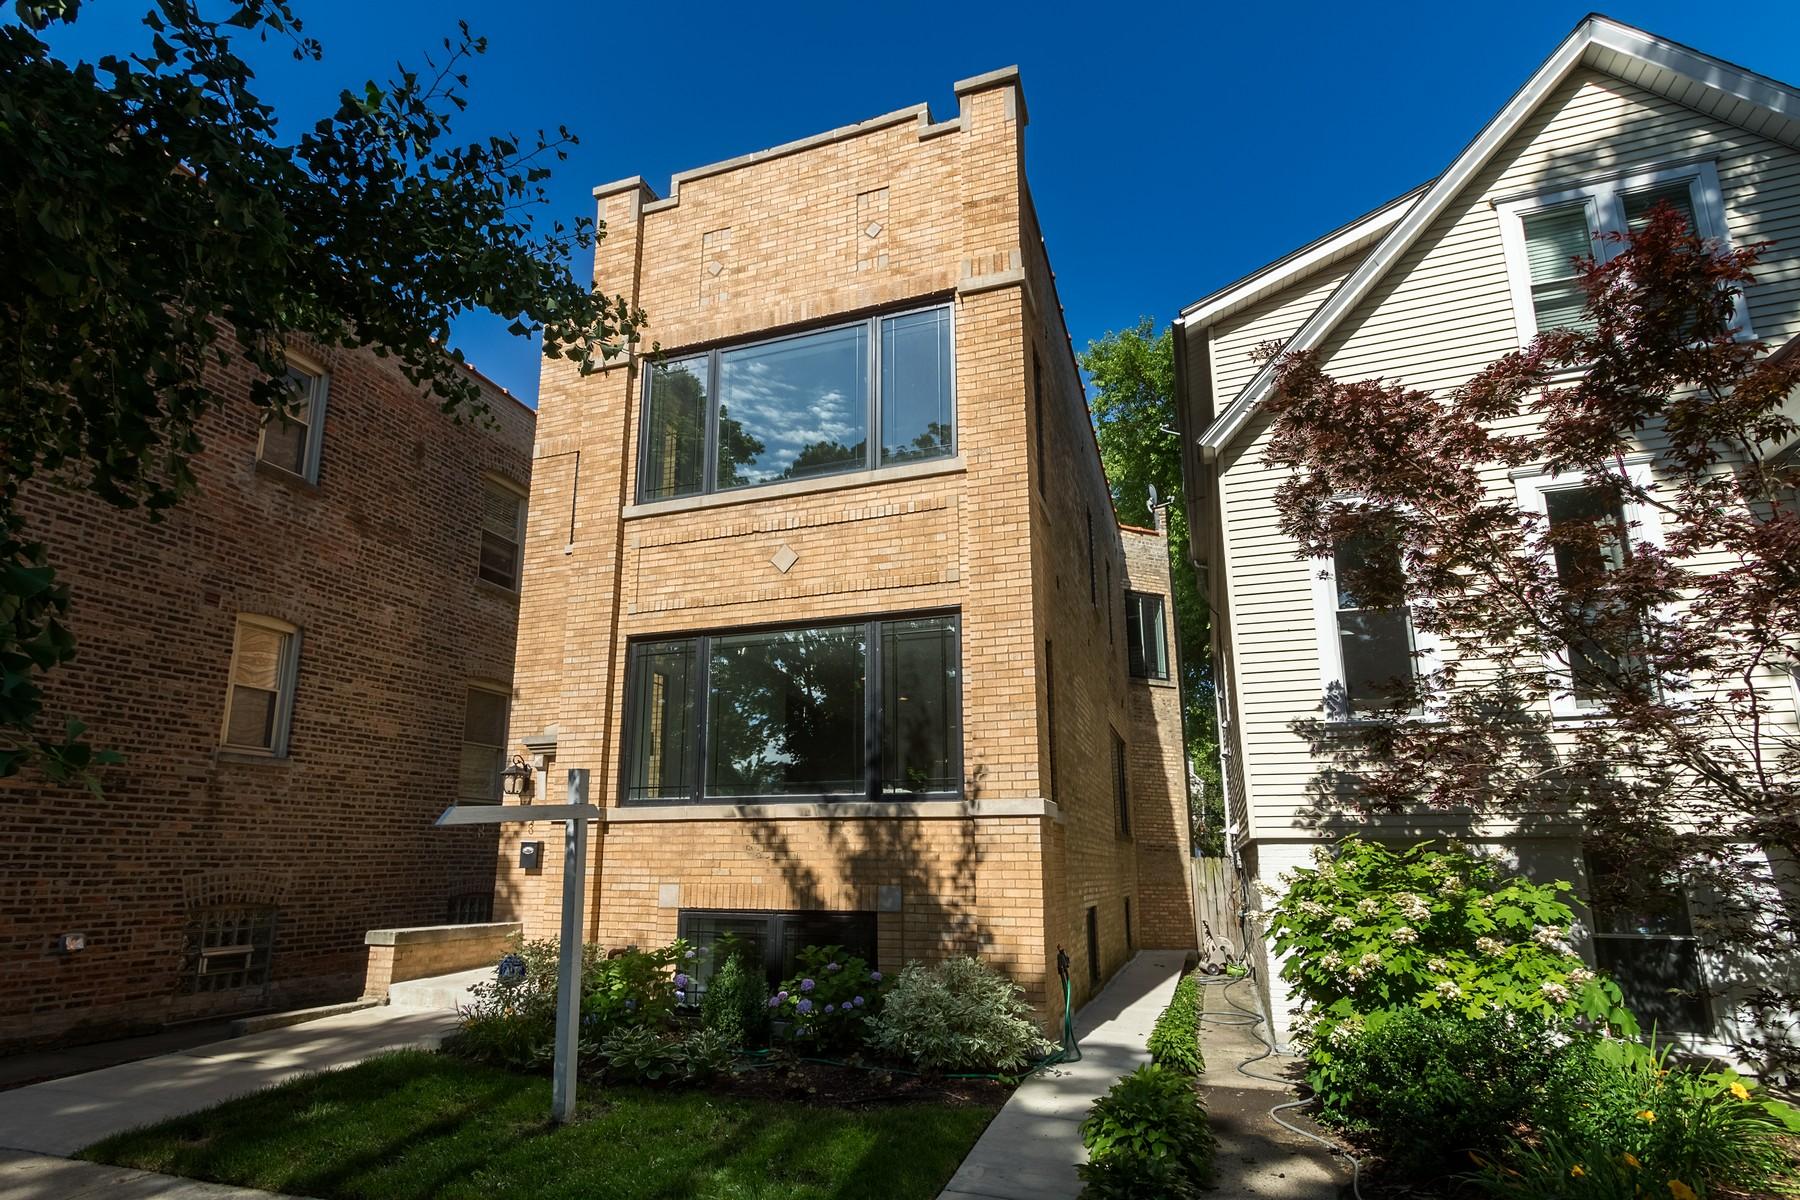 獨棟家庭住宅 為 出售 在 Stunning New Interior in Roscoe Village Home 3306 N Bell Avenue Chicago, 伊利諾斯州, 60618 美國